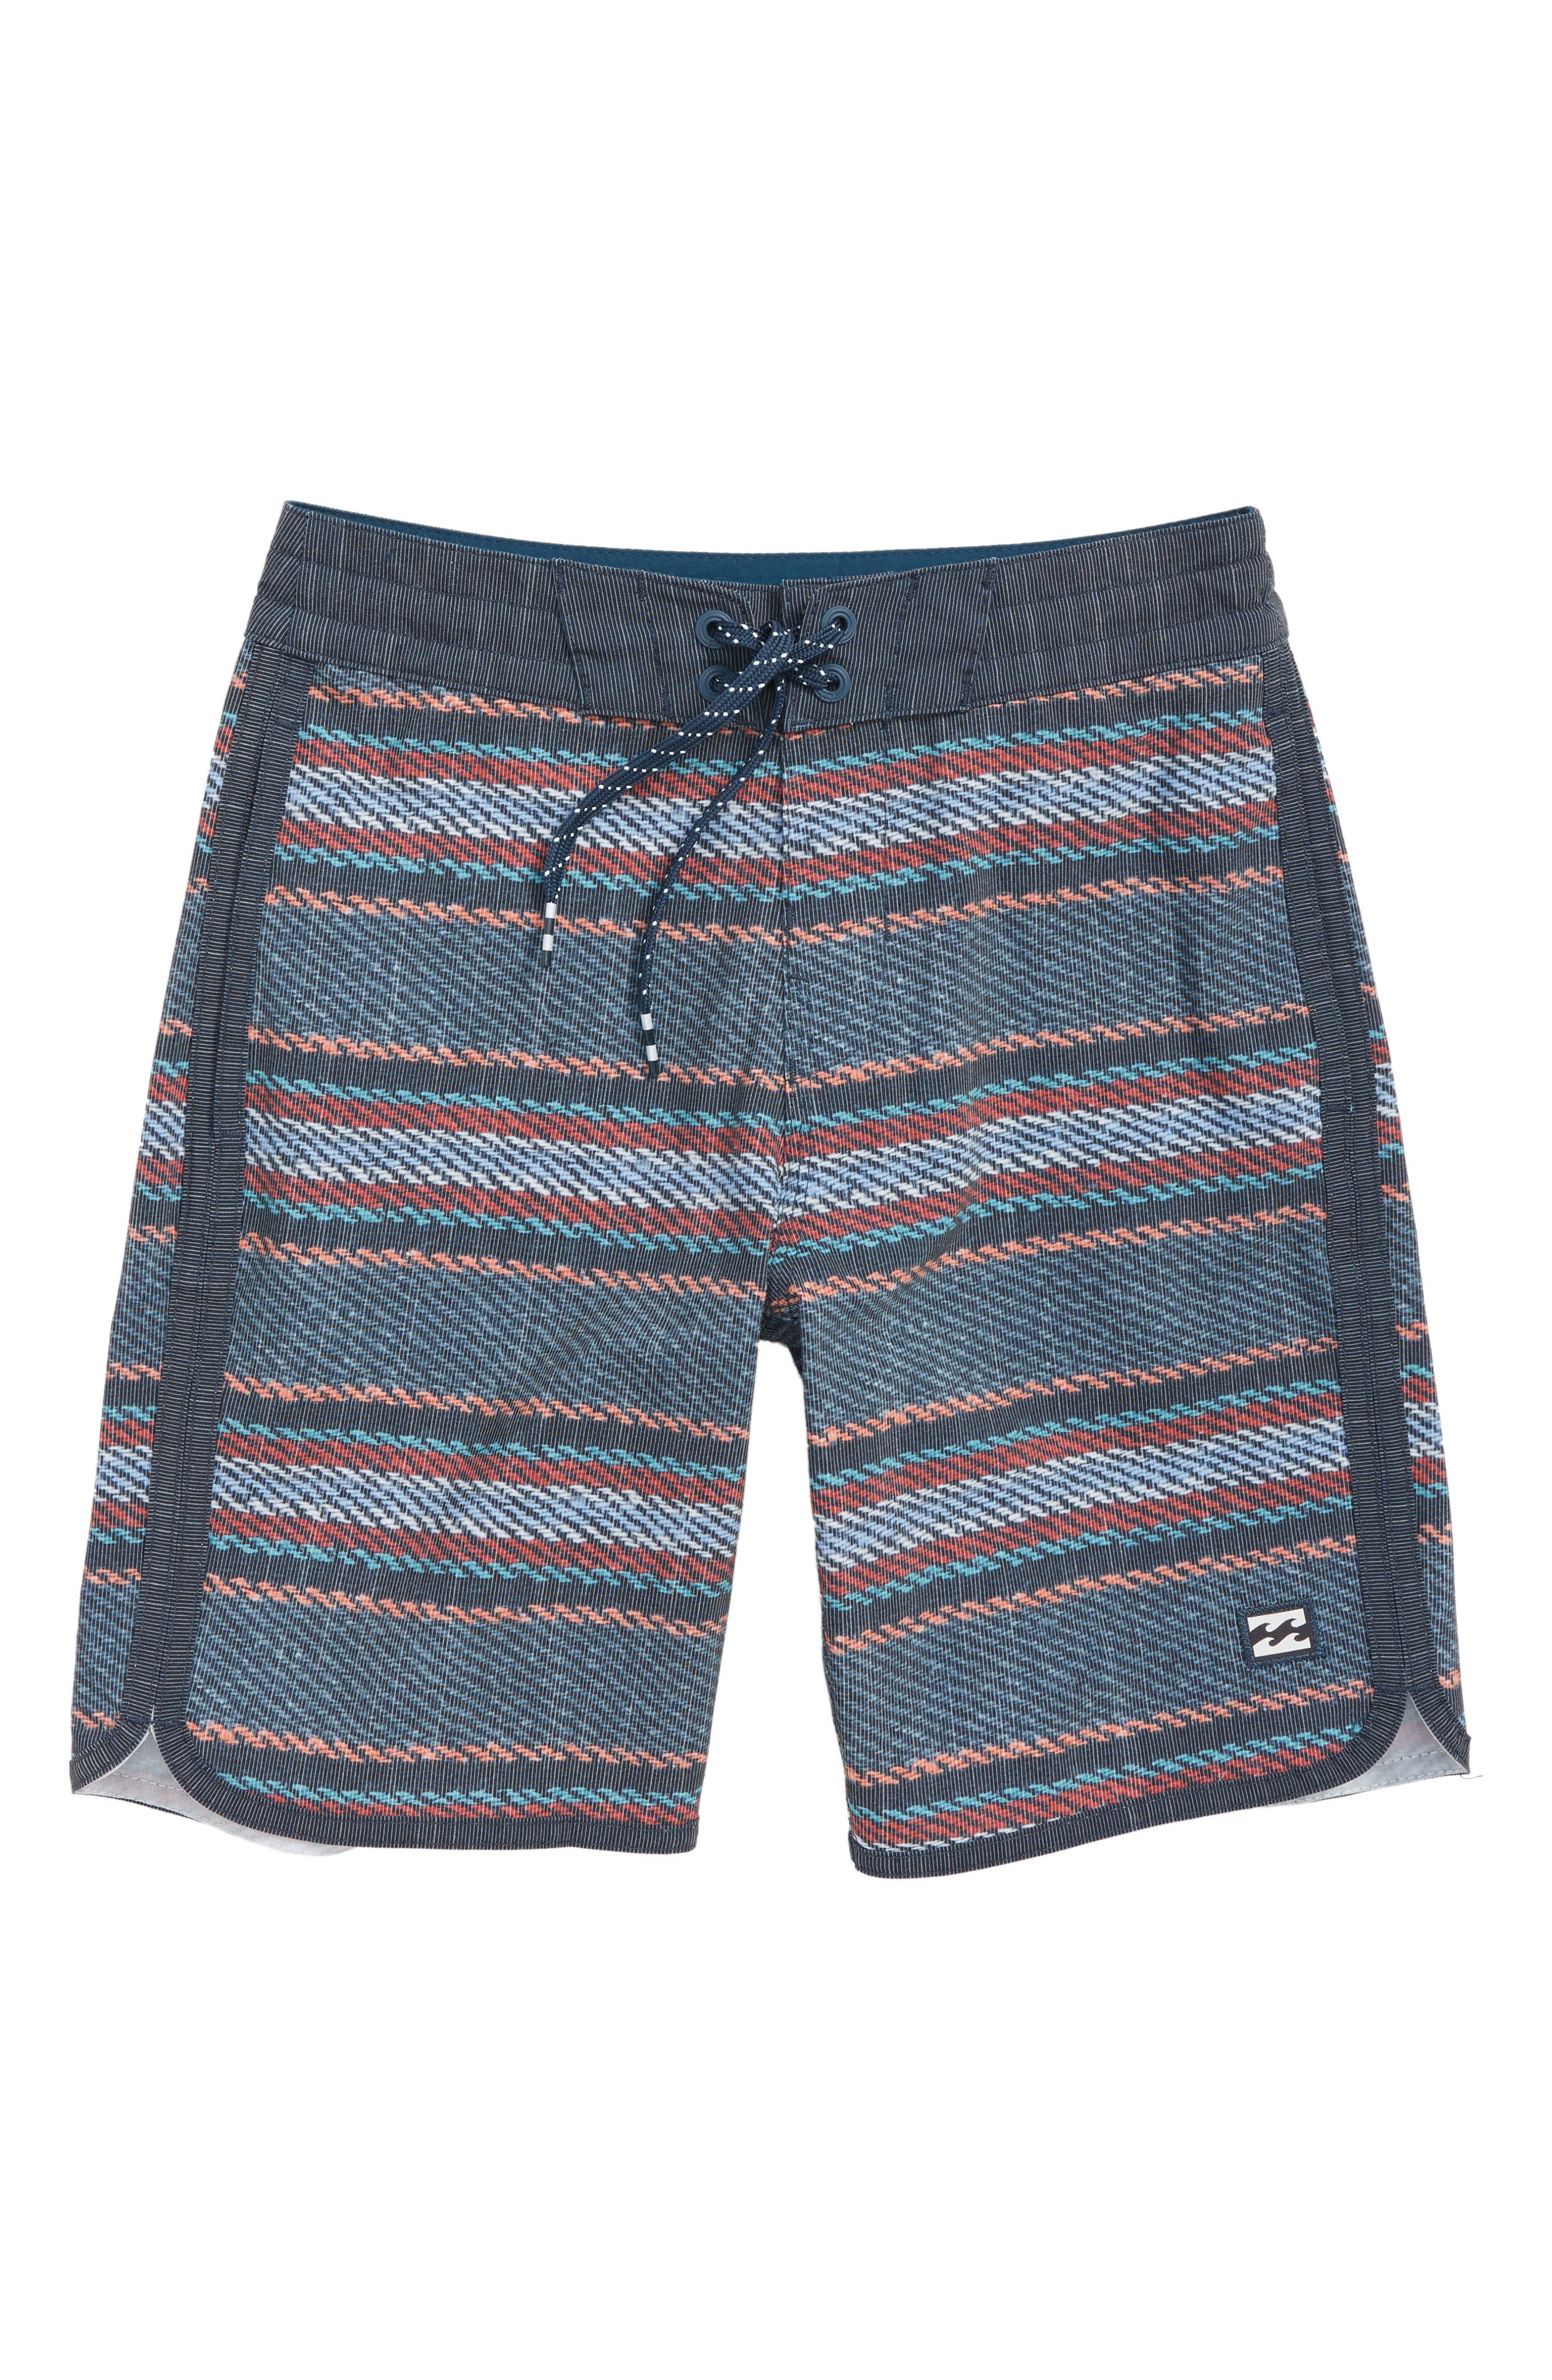 73 LT Lineup Board Shorts,                         Main,                         color, INDIGO STRIPE